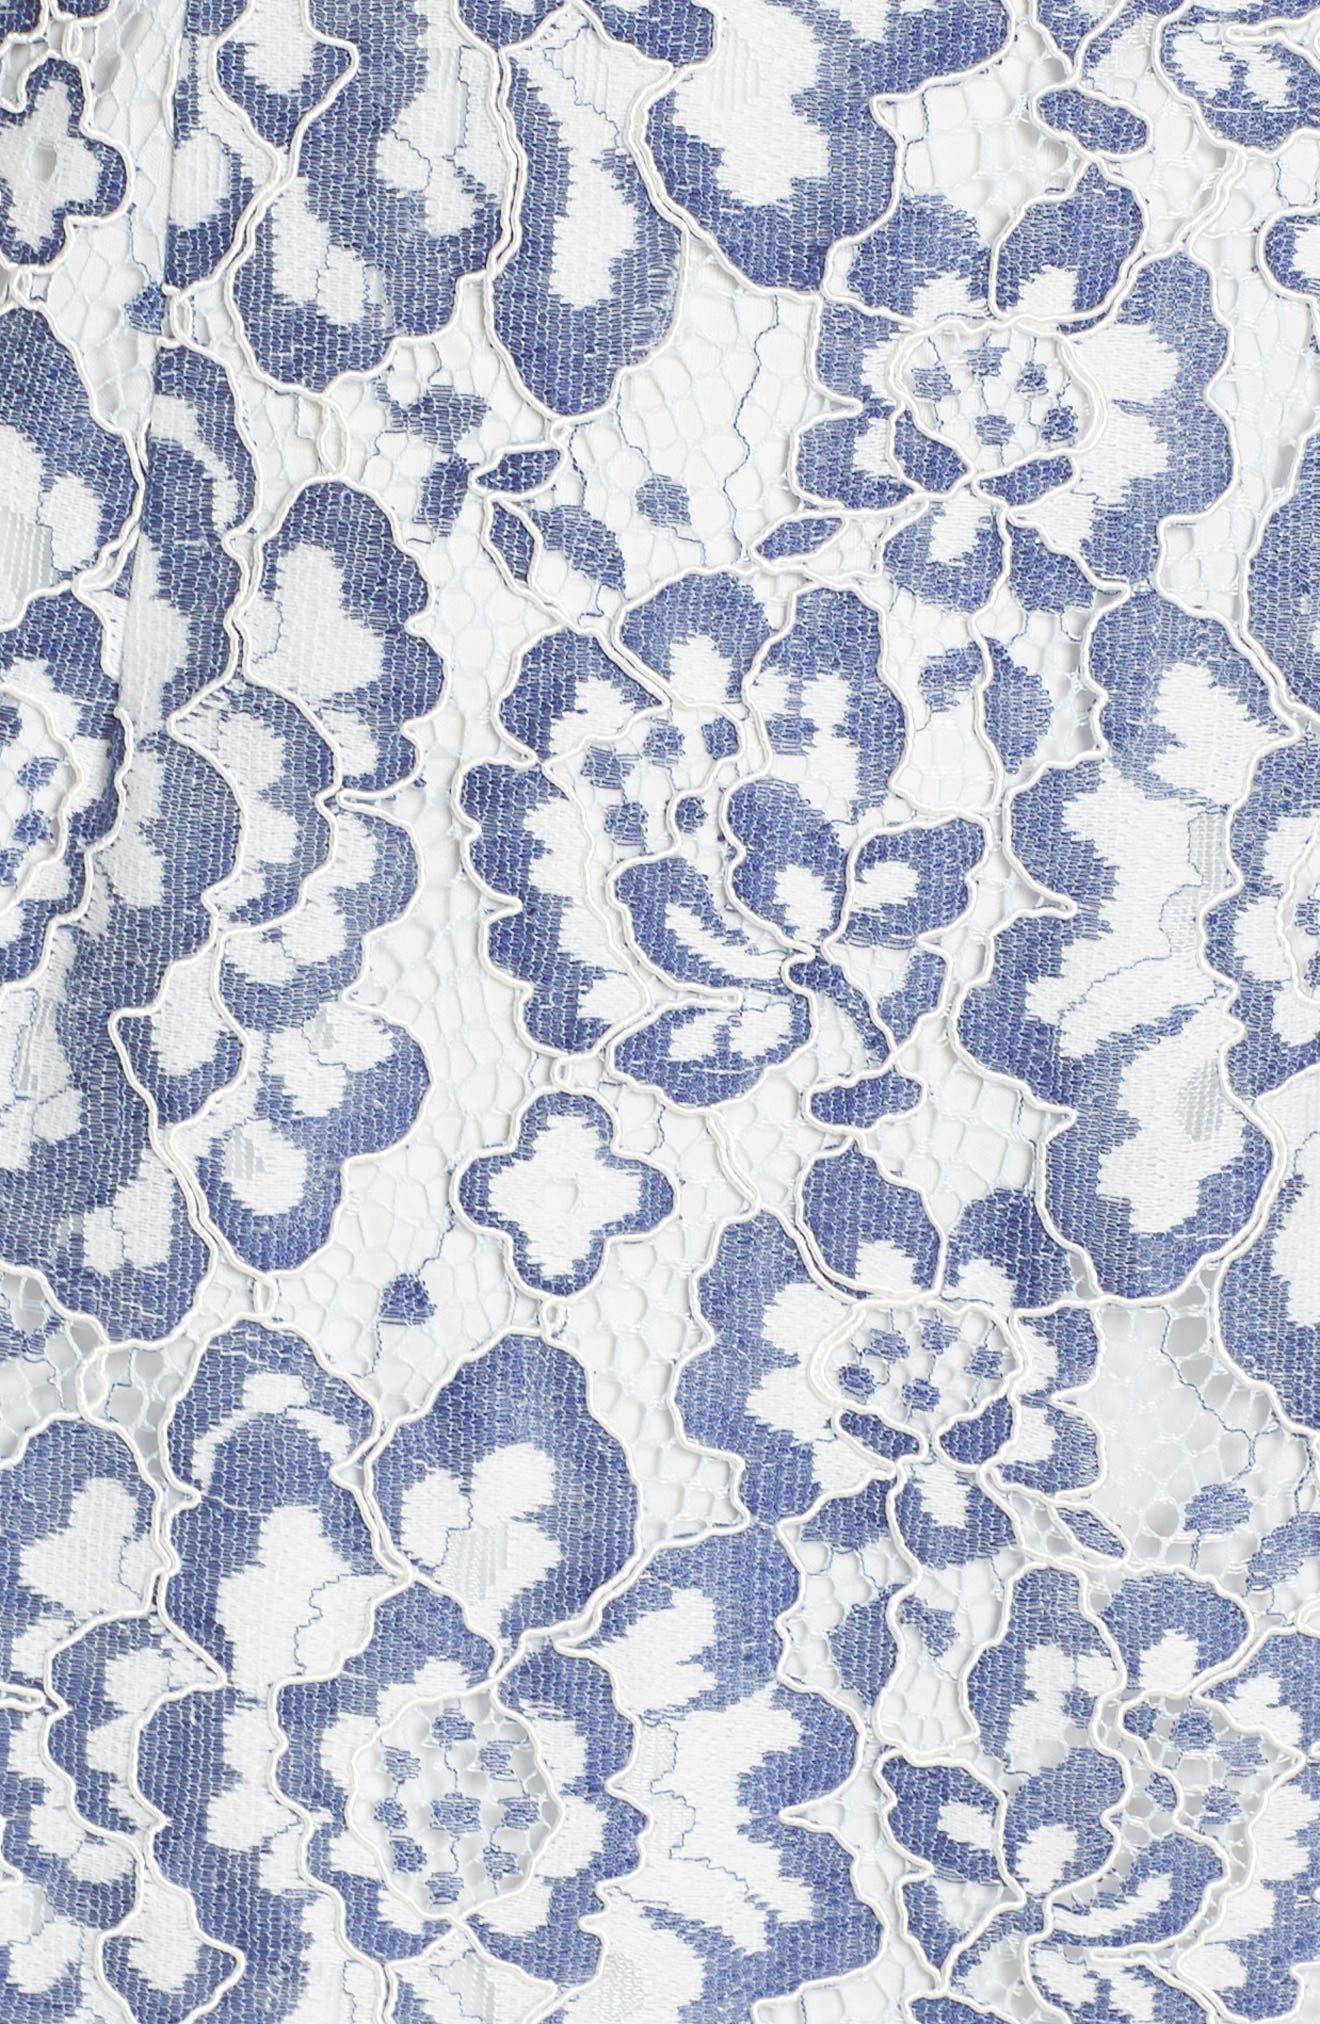 Elisa Two Tone Lace Sheath Dress,                             Alternate thumbnail 6, color,                             Blue/ White